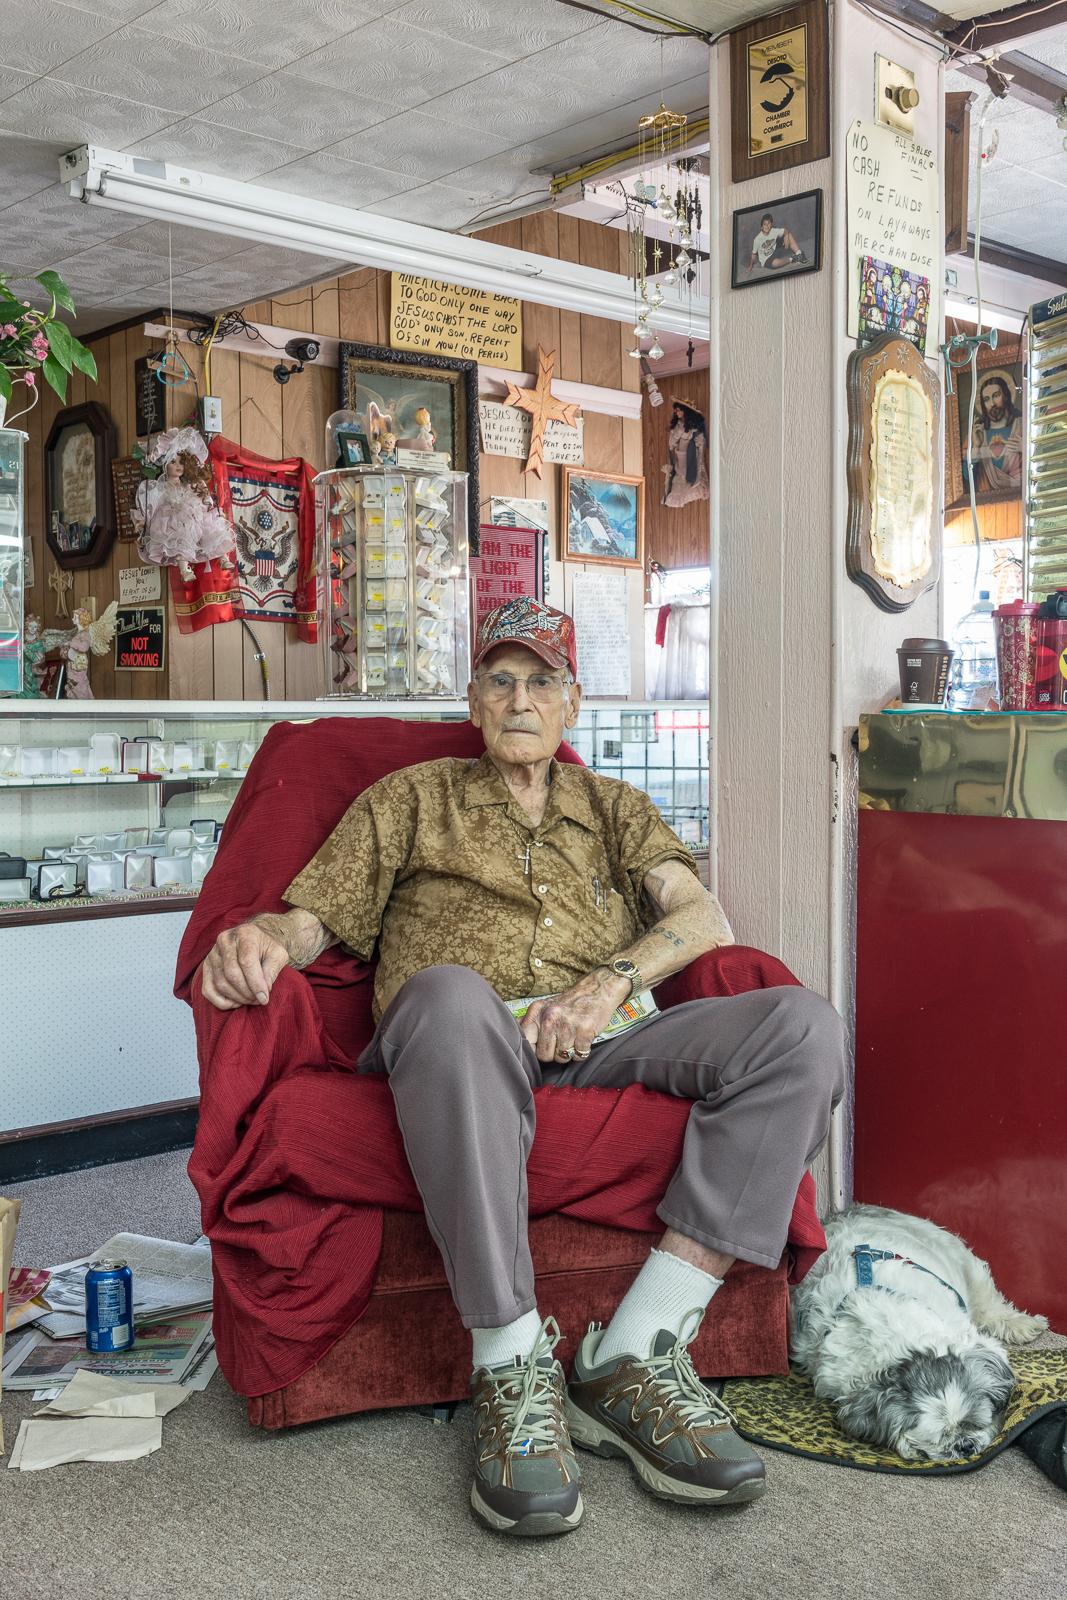 Augie at the Jewelry Shop, De Soto, Missouri, 2017 © Nate Larson